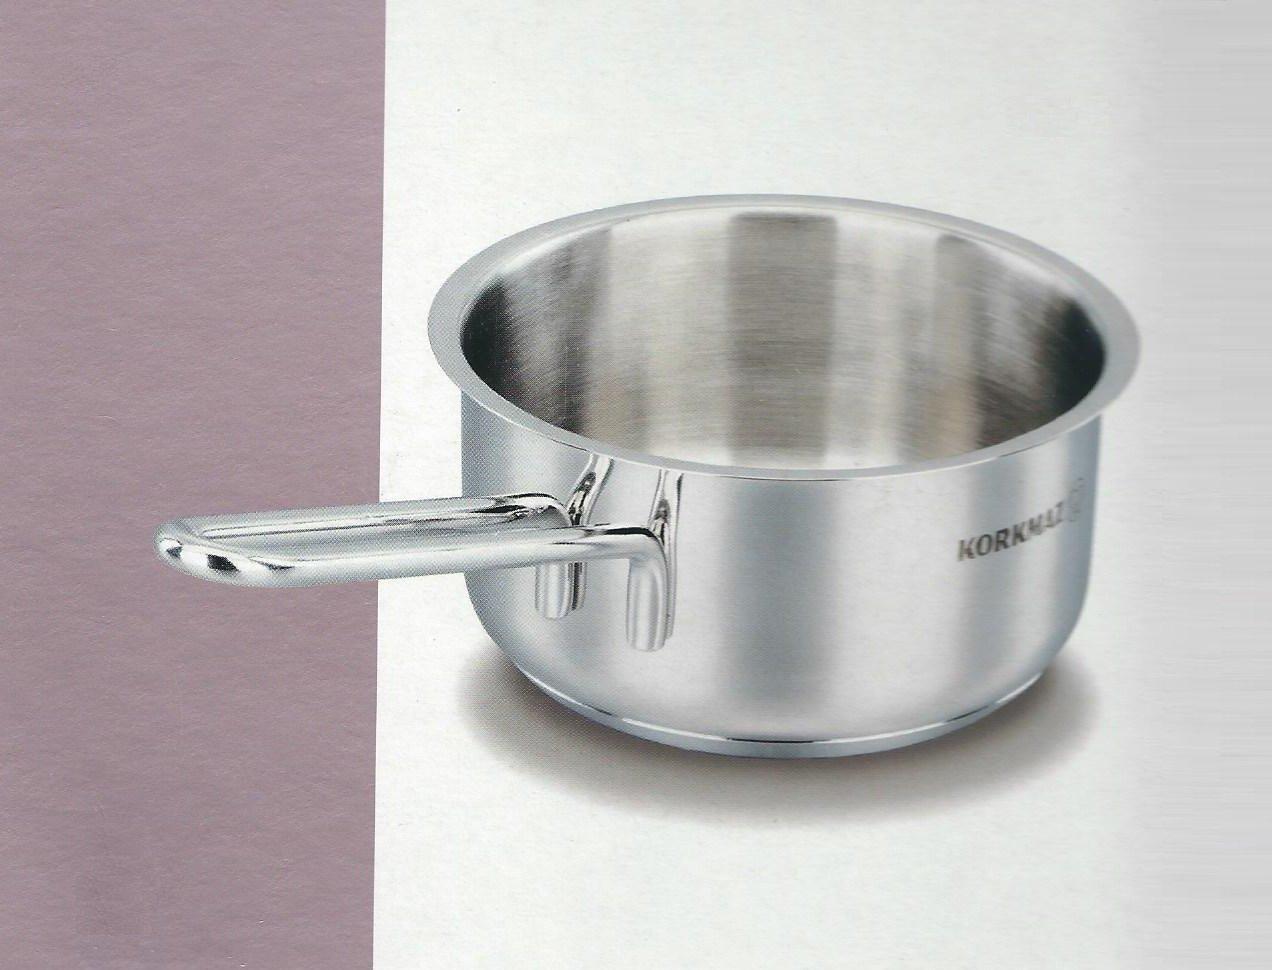 Korkmaz 18/10 Stainless Steel Saucepan 5.5''//1L - Solar Base System All Stove & Induction Pot 14cm